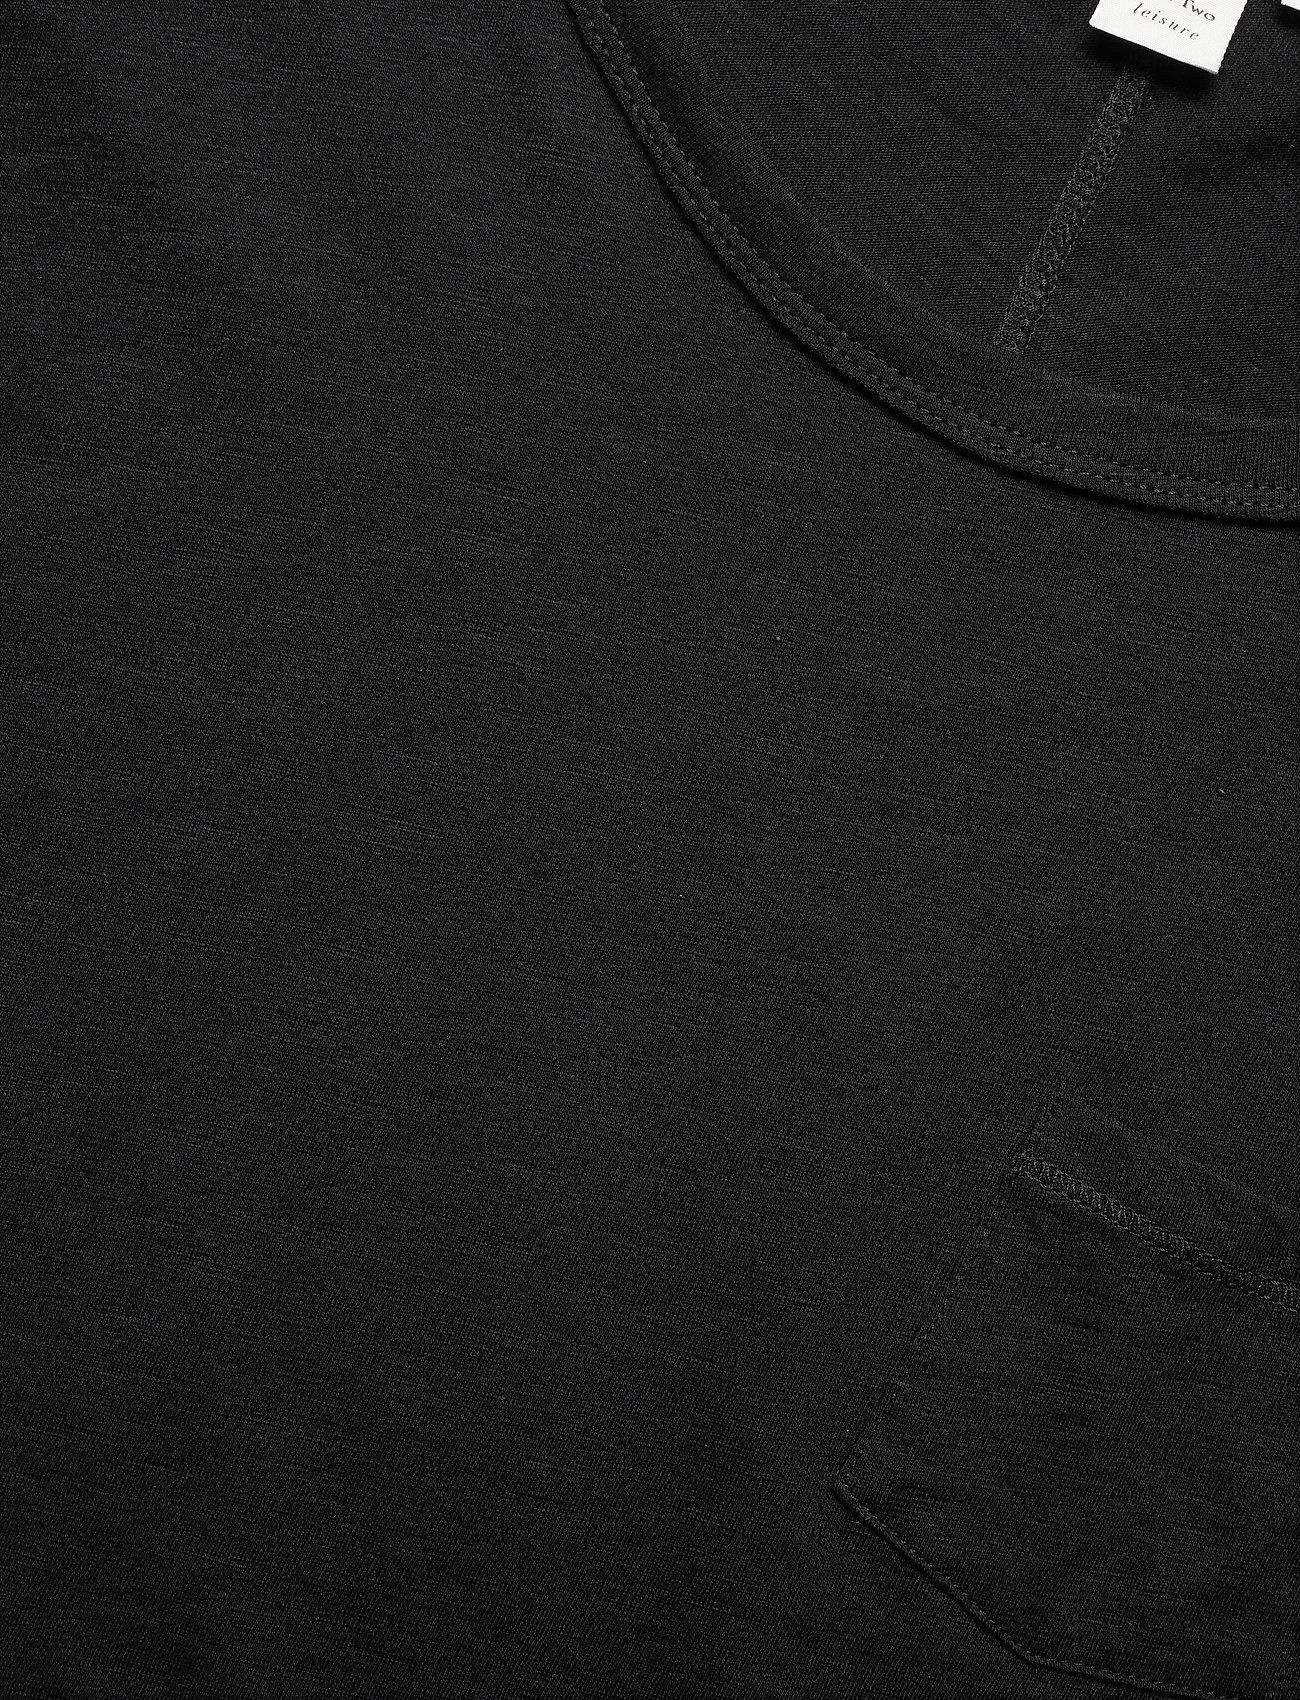 Birtepw Ts   - Part Two -  Women's T-shirts & Tops Buy Newest